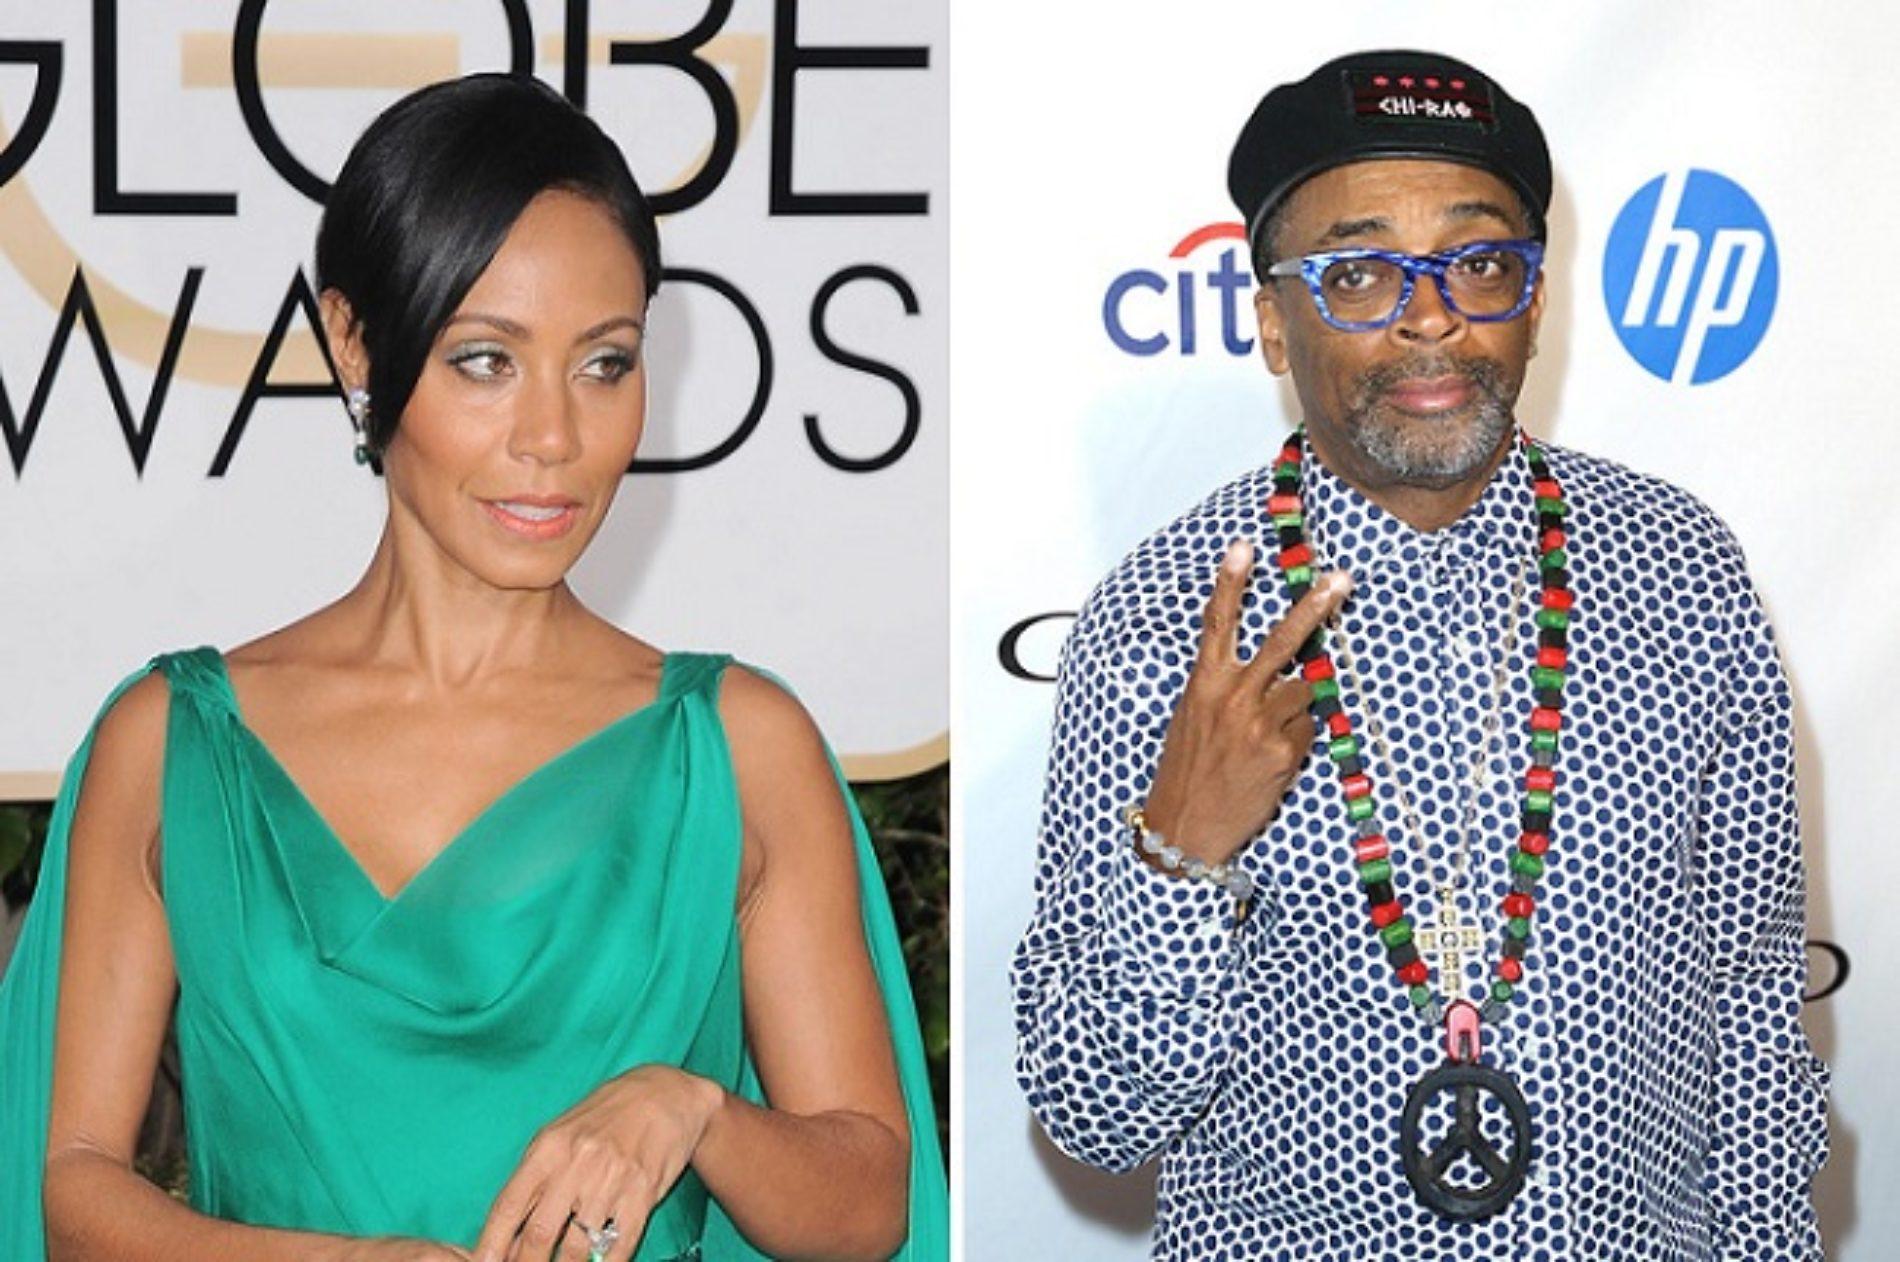 Director Spike Lee and Actress Jada Pinkett Smith To Boycott The Oscars